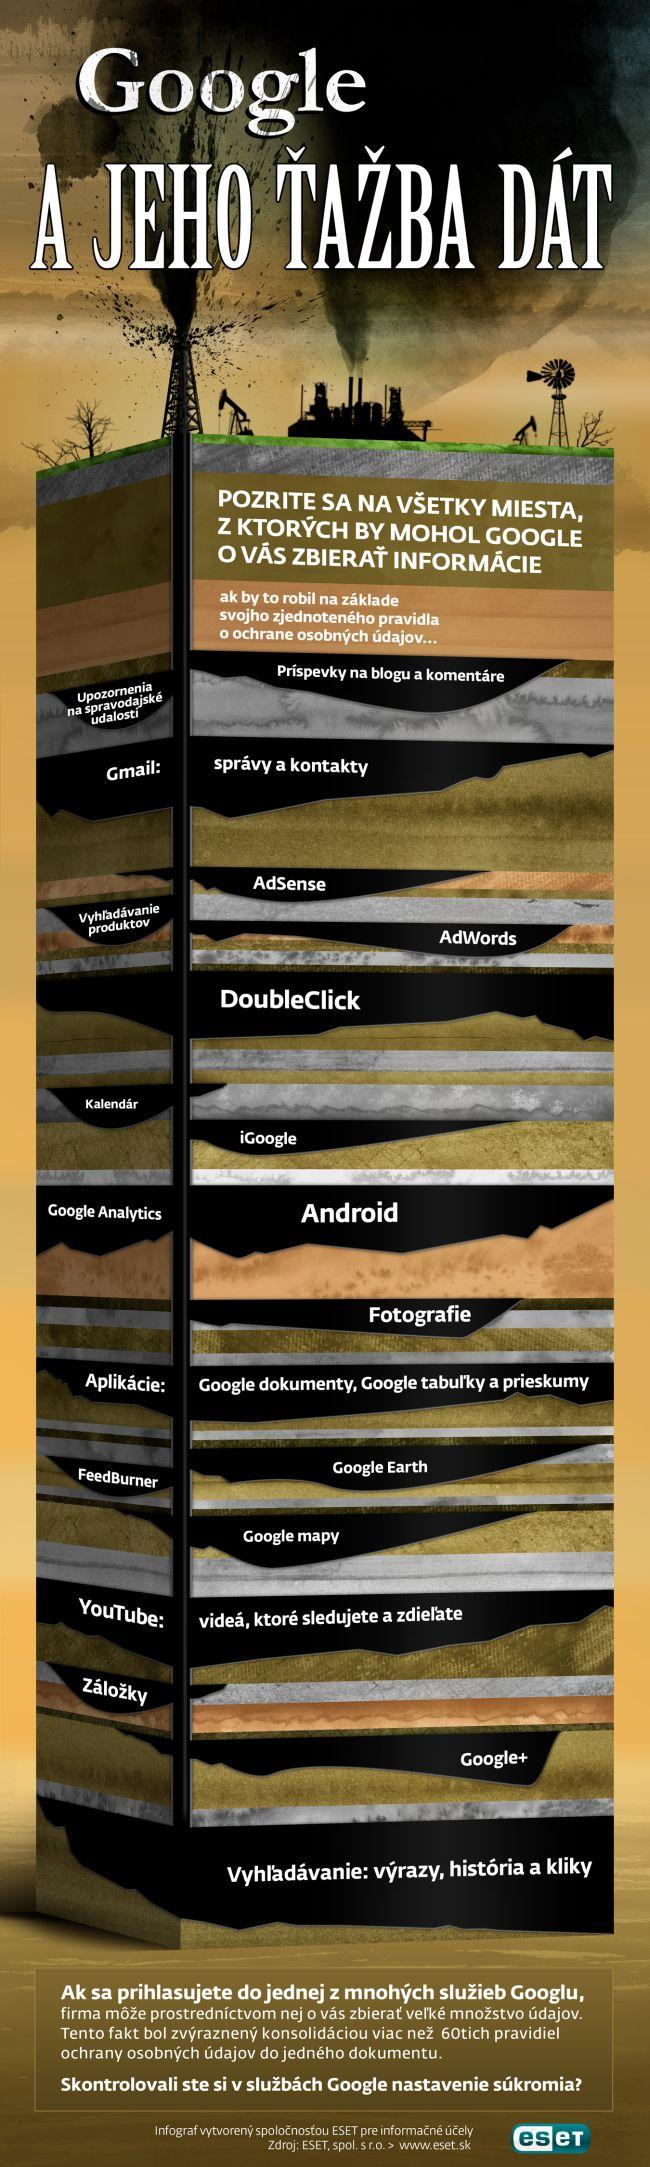 Google a jeho ťažba dát